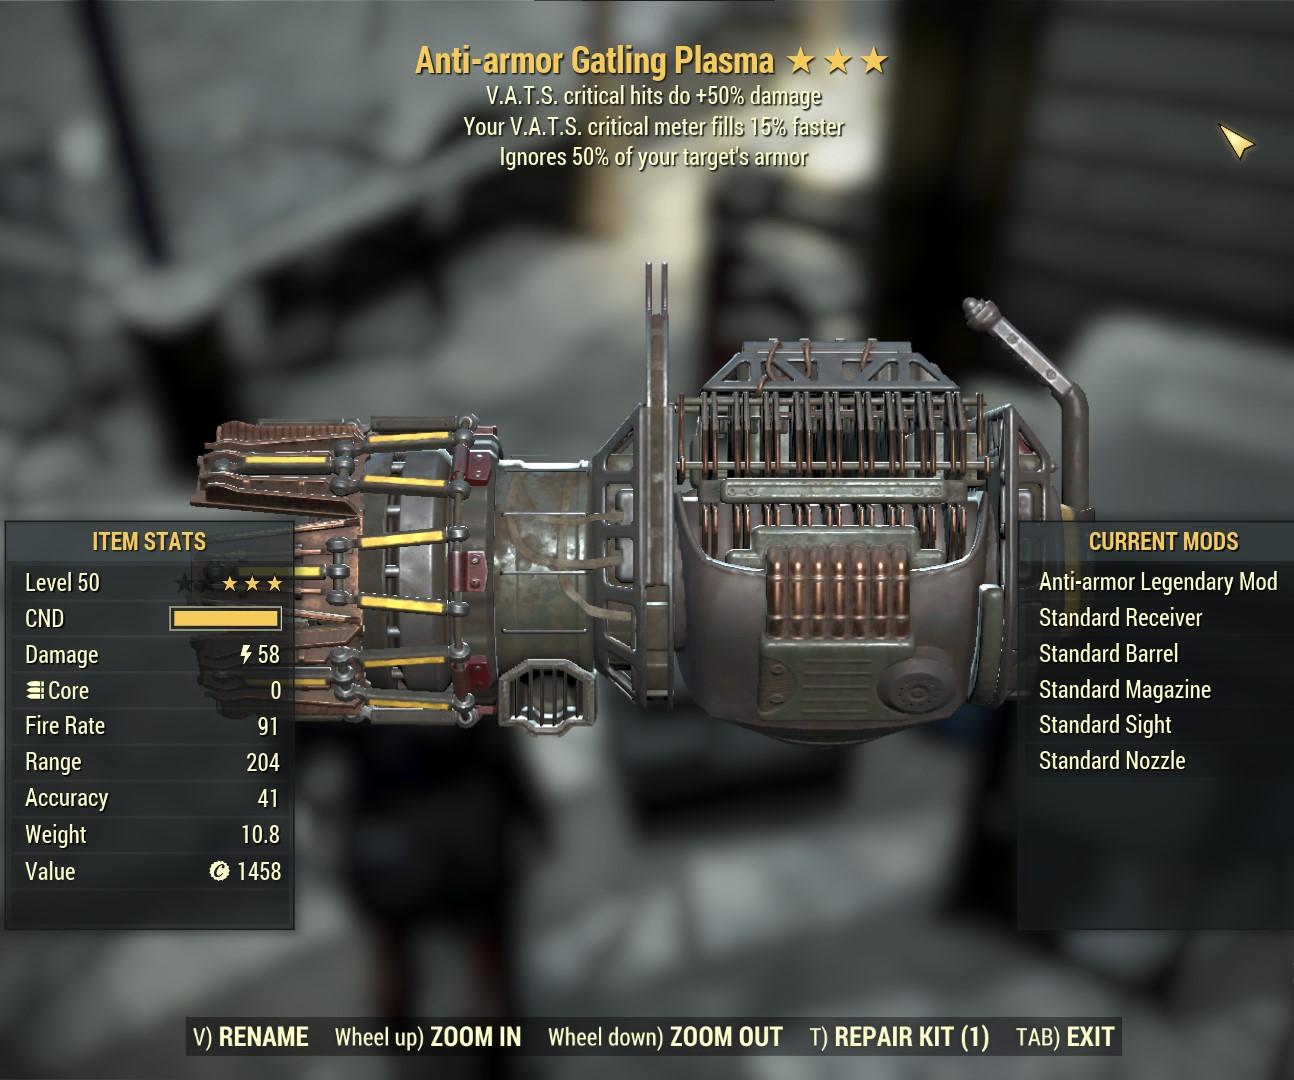 Anti-armor Gatling Plasma (VATS Crit. +50% Dmg / VATS Crit. Fills 15% Faster)